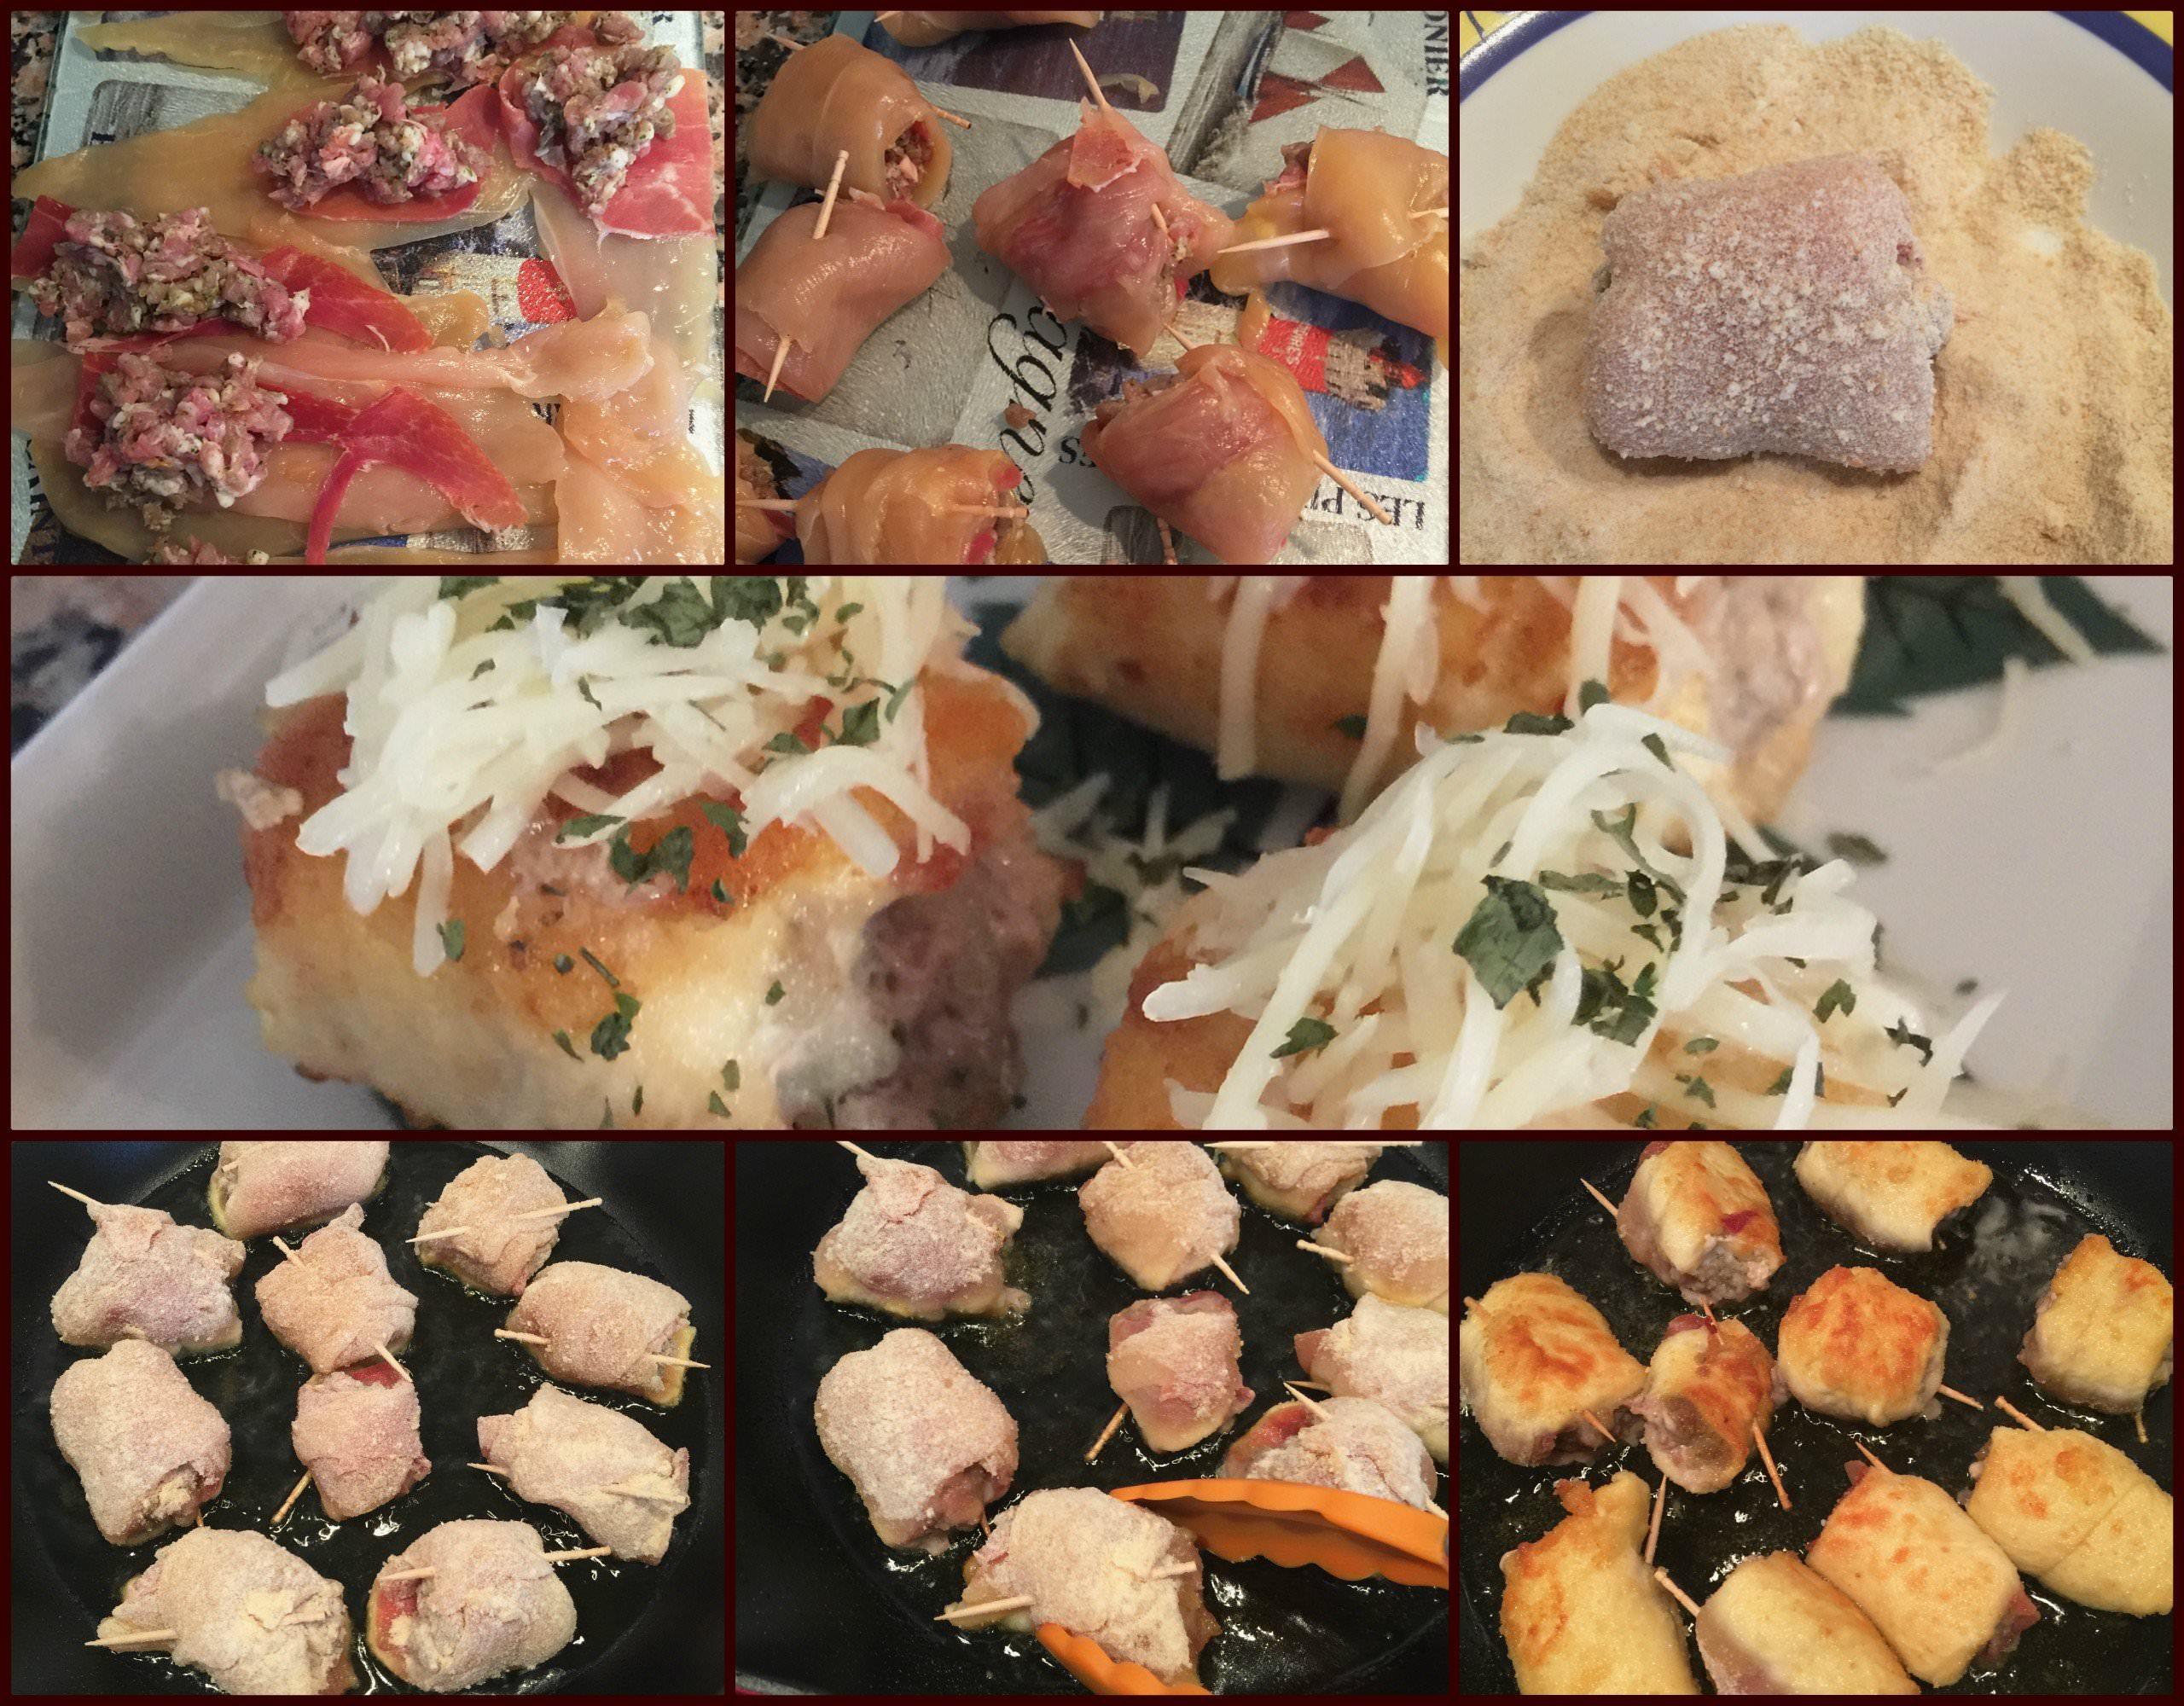 Pasos Rollitos de Pechuga de Pollo Rellenos y Gratinados con Queso